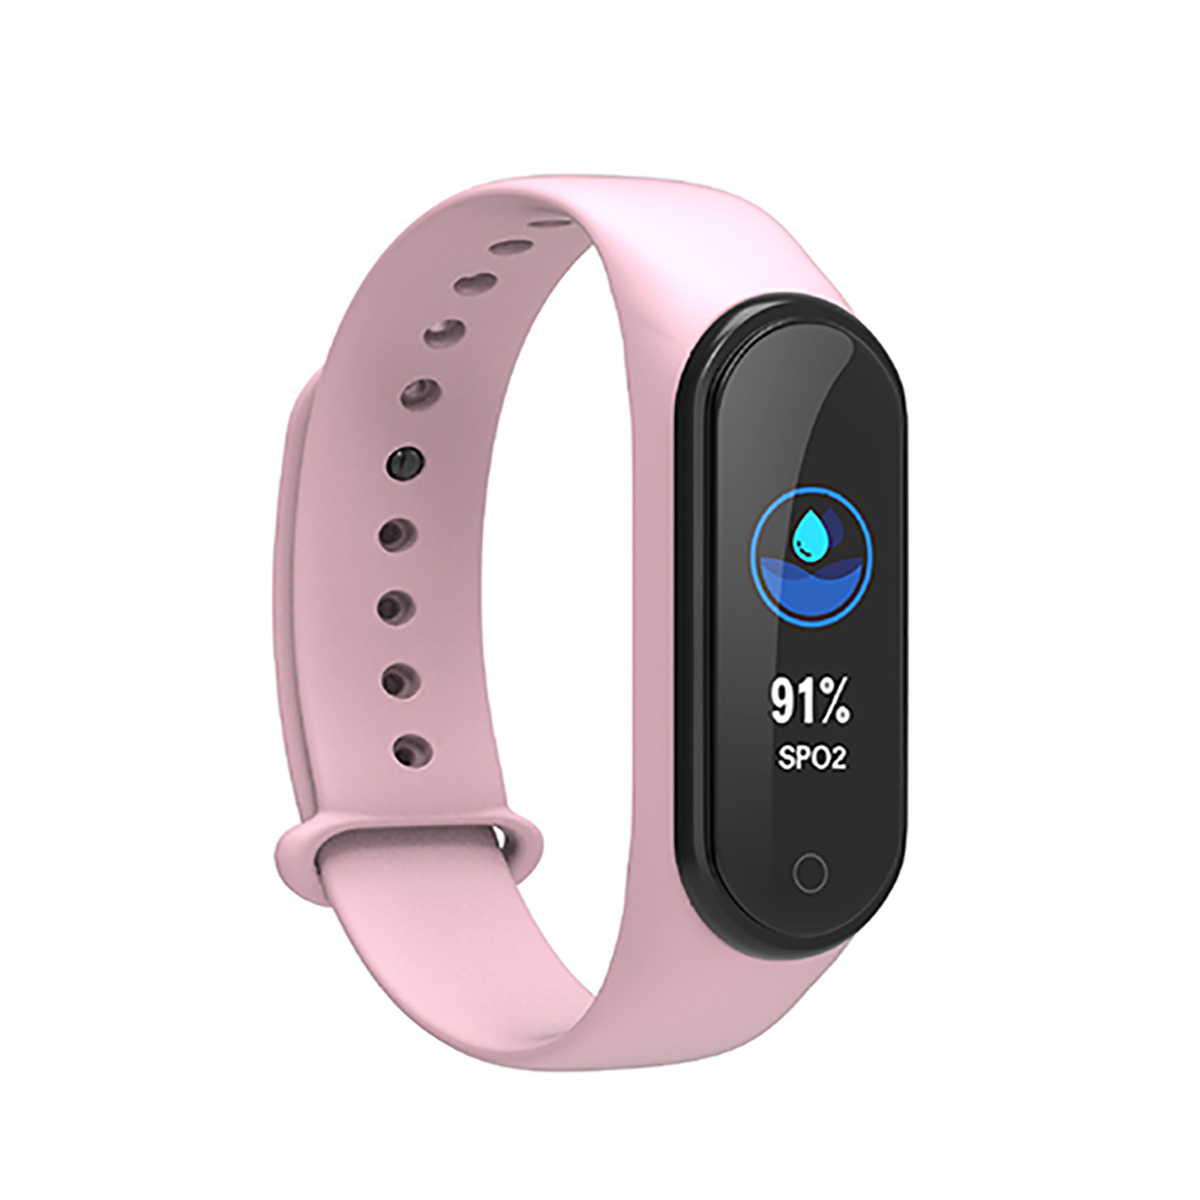 Hc981298ff94b4ee5ab0507b7c847fb26y New M4 Smart Band Fitness Tracker Smart Watch Sport Smart Bracelet Heart Rate Blood Pressure Smartband Monitor Health Wristband